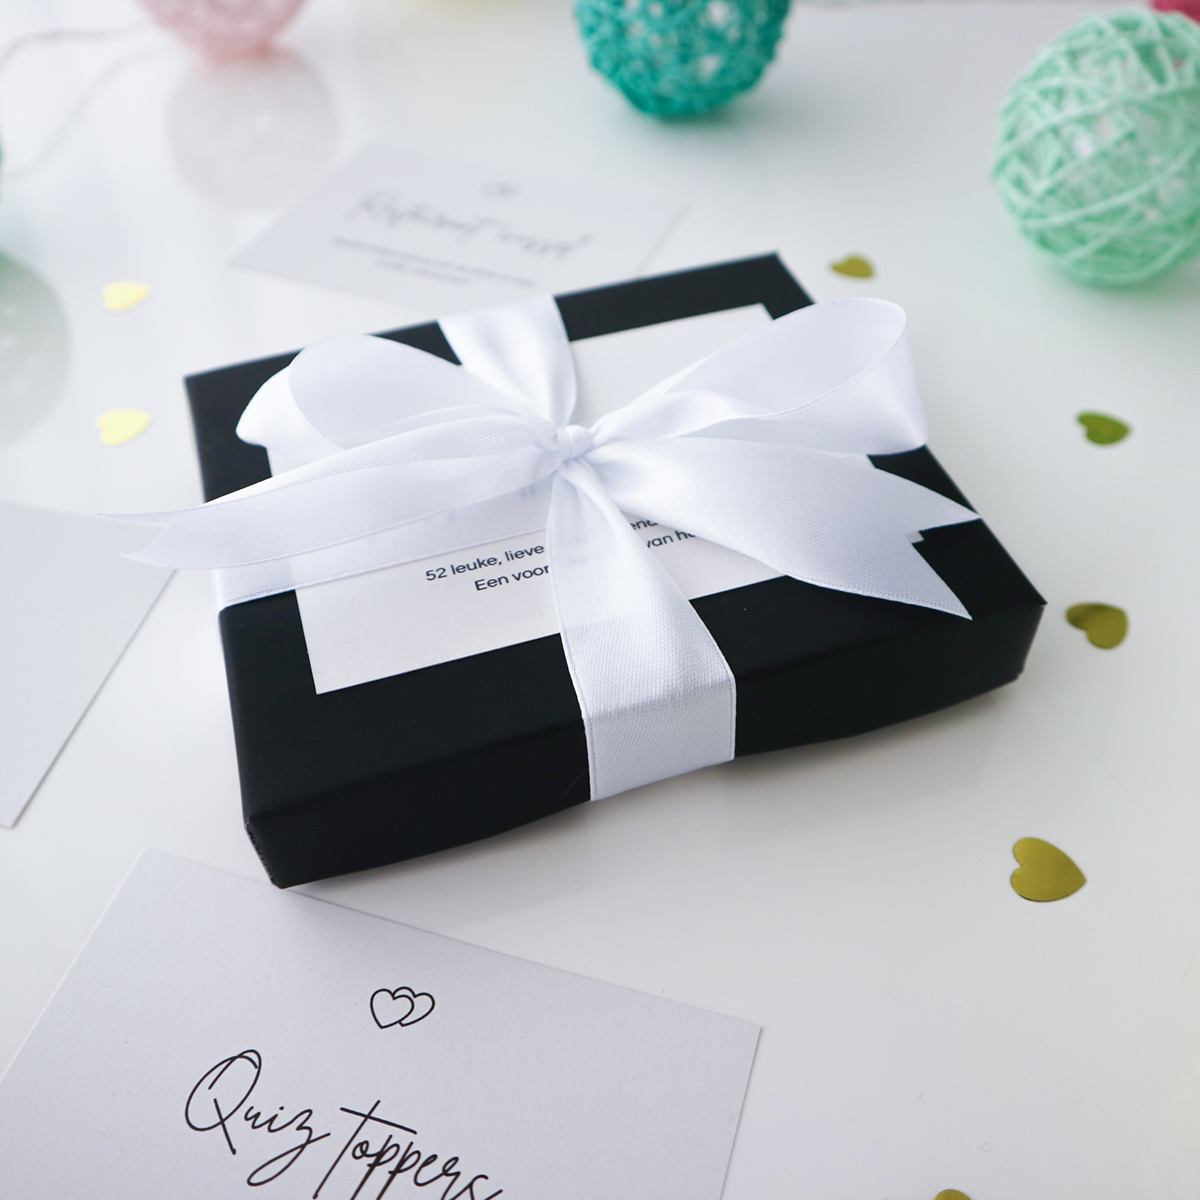 Date Ideeën Box, Date Ideas Box, Originele date ideeën